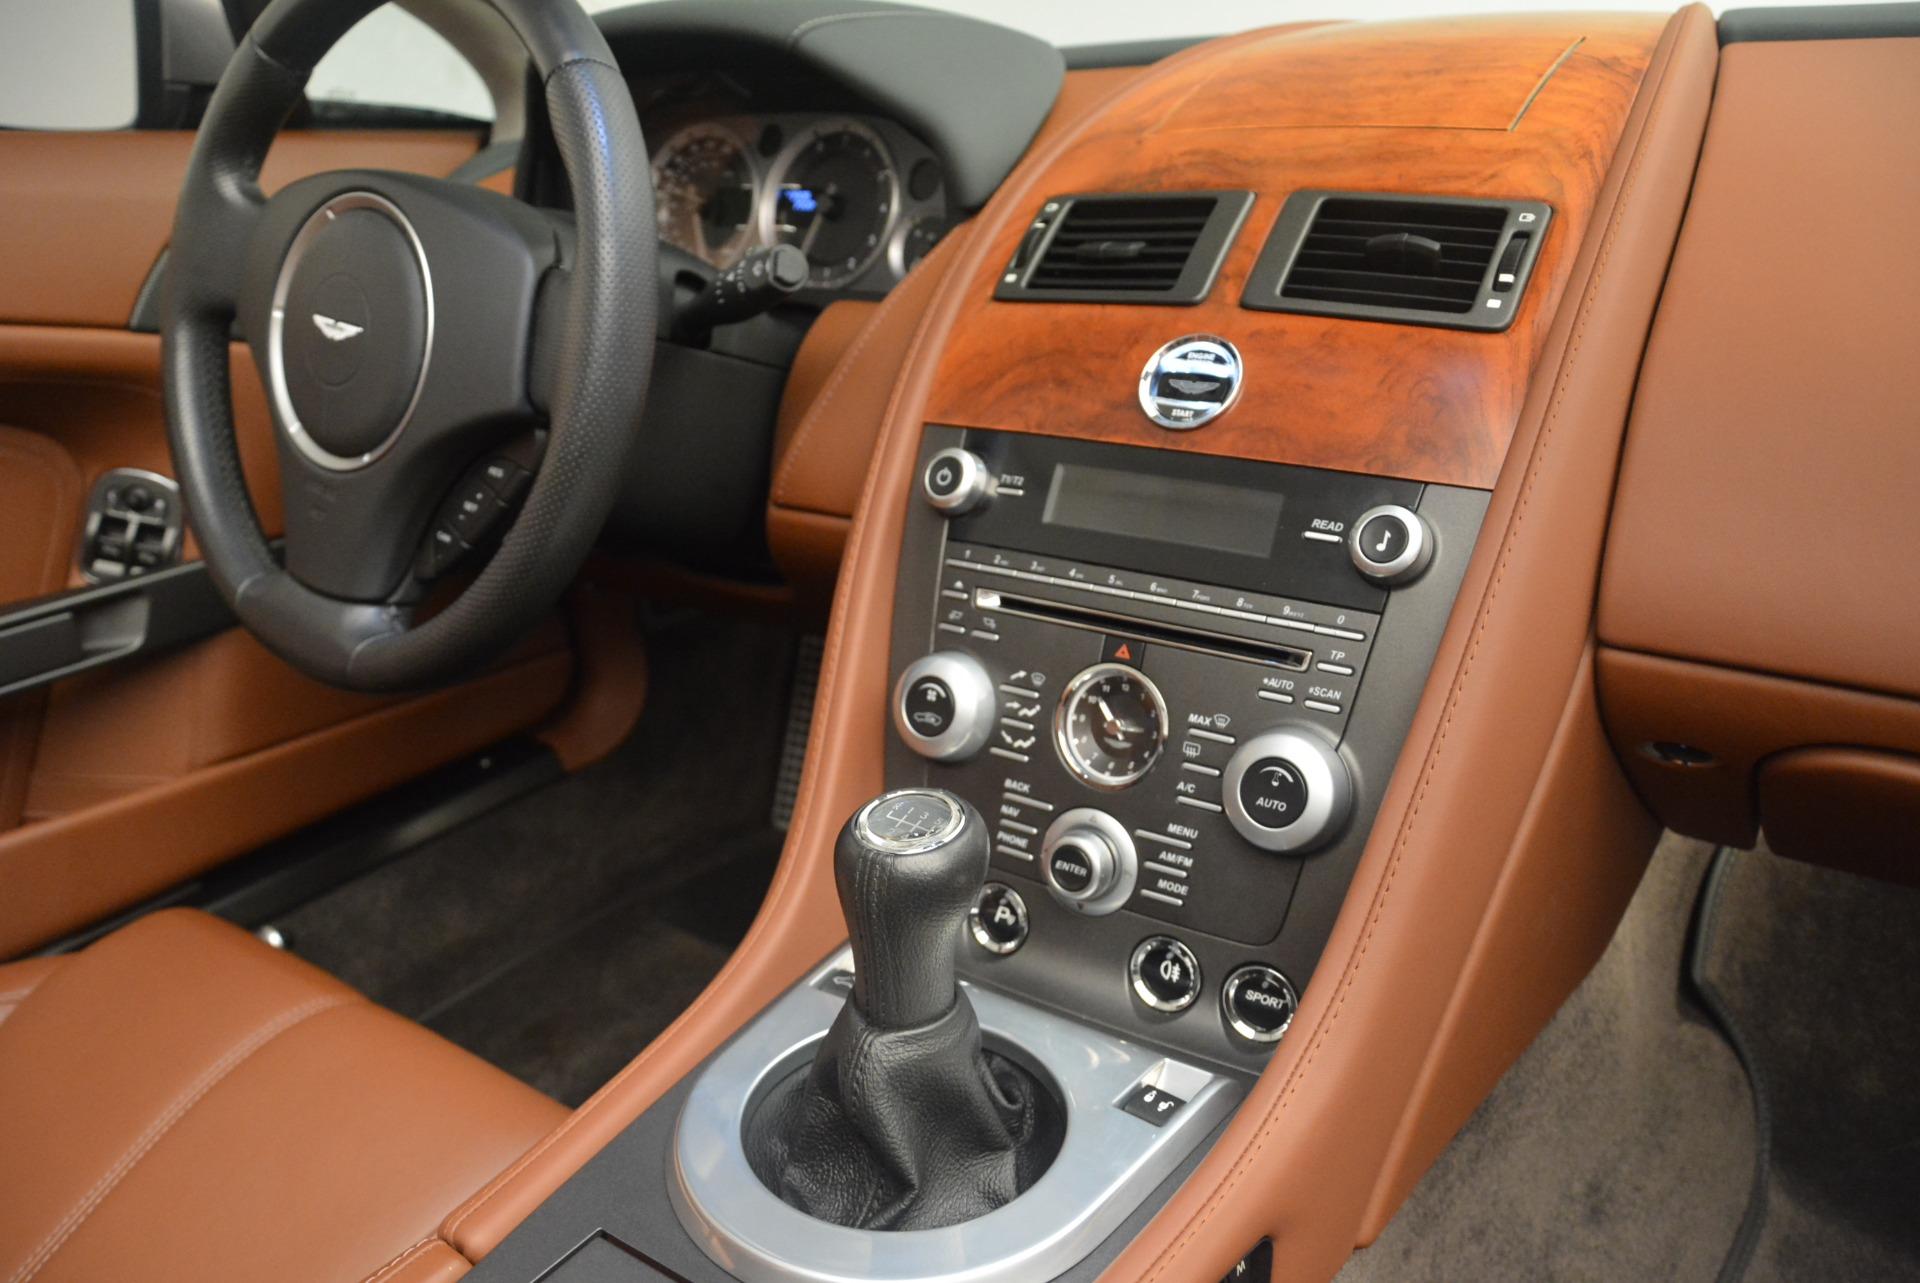 Used 2015 Aston Martin V8 Vantage Roadster For Sale In Greenwich, CT. Alfa Romeo of Greenwich, 7396 2463_p23